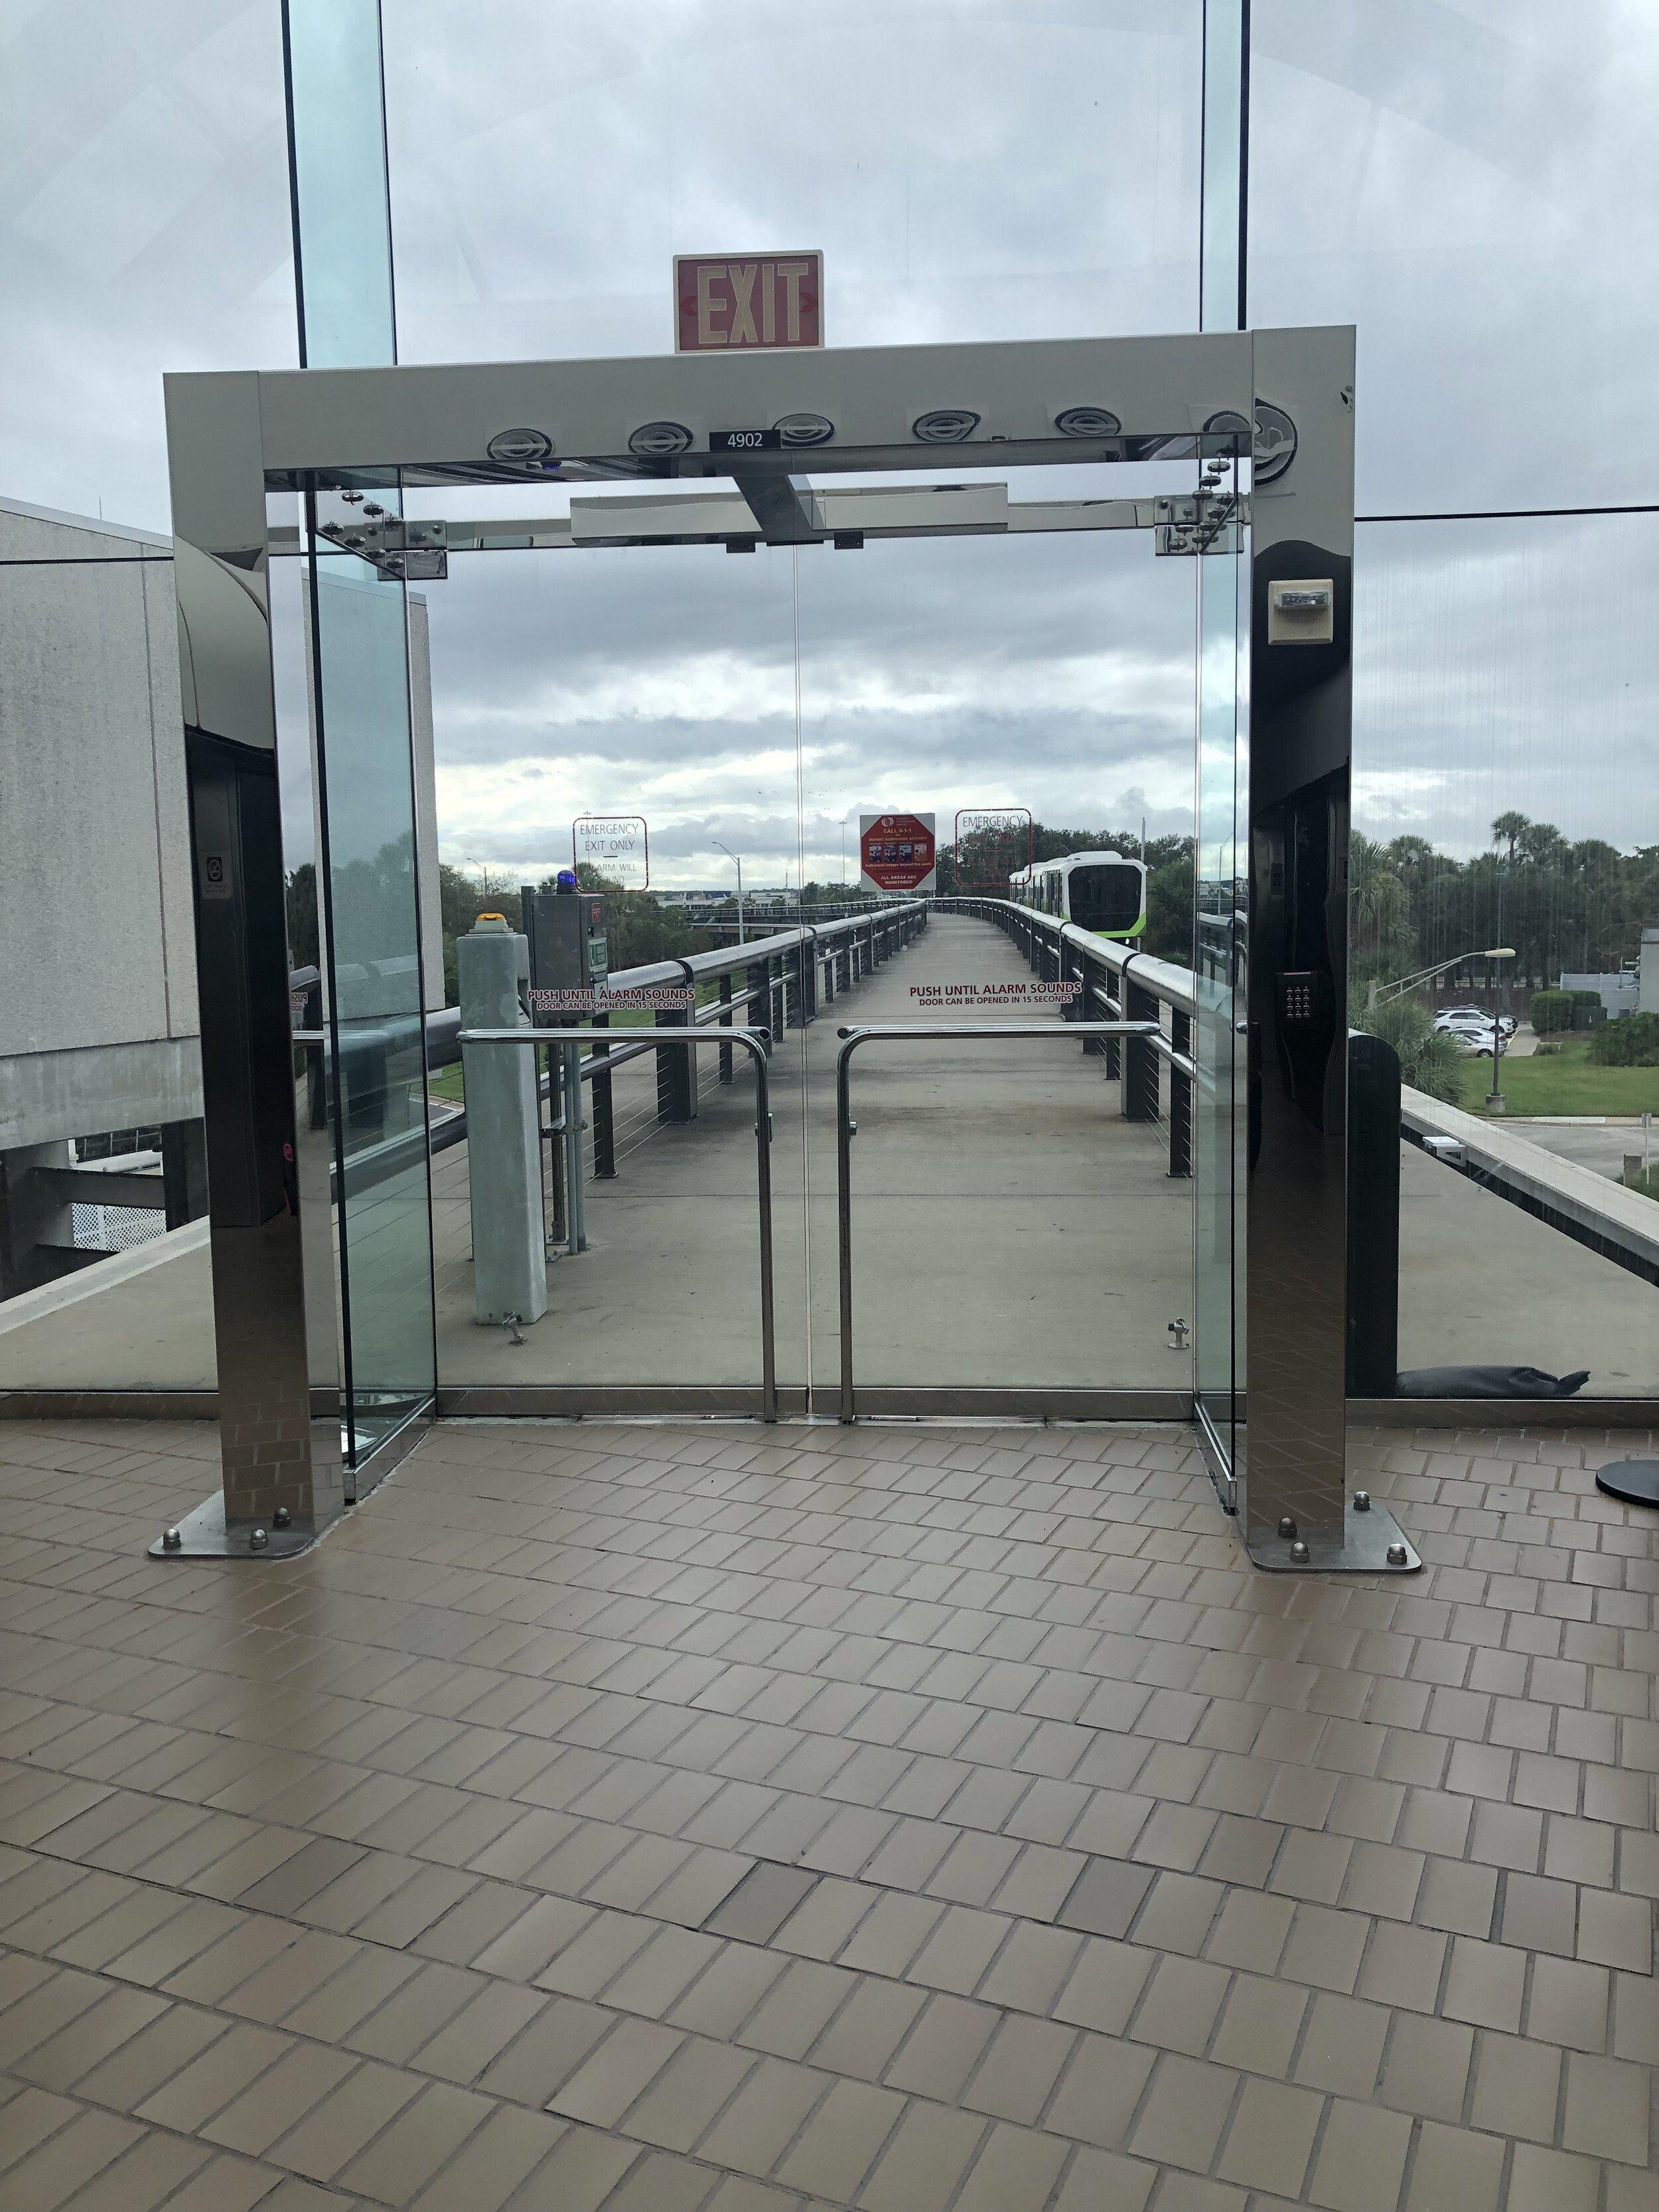 The tram at Orlando International Airport